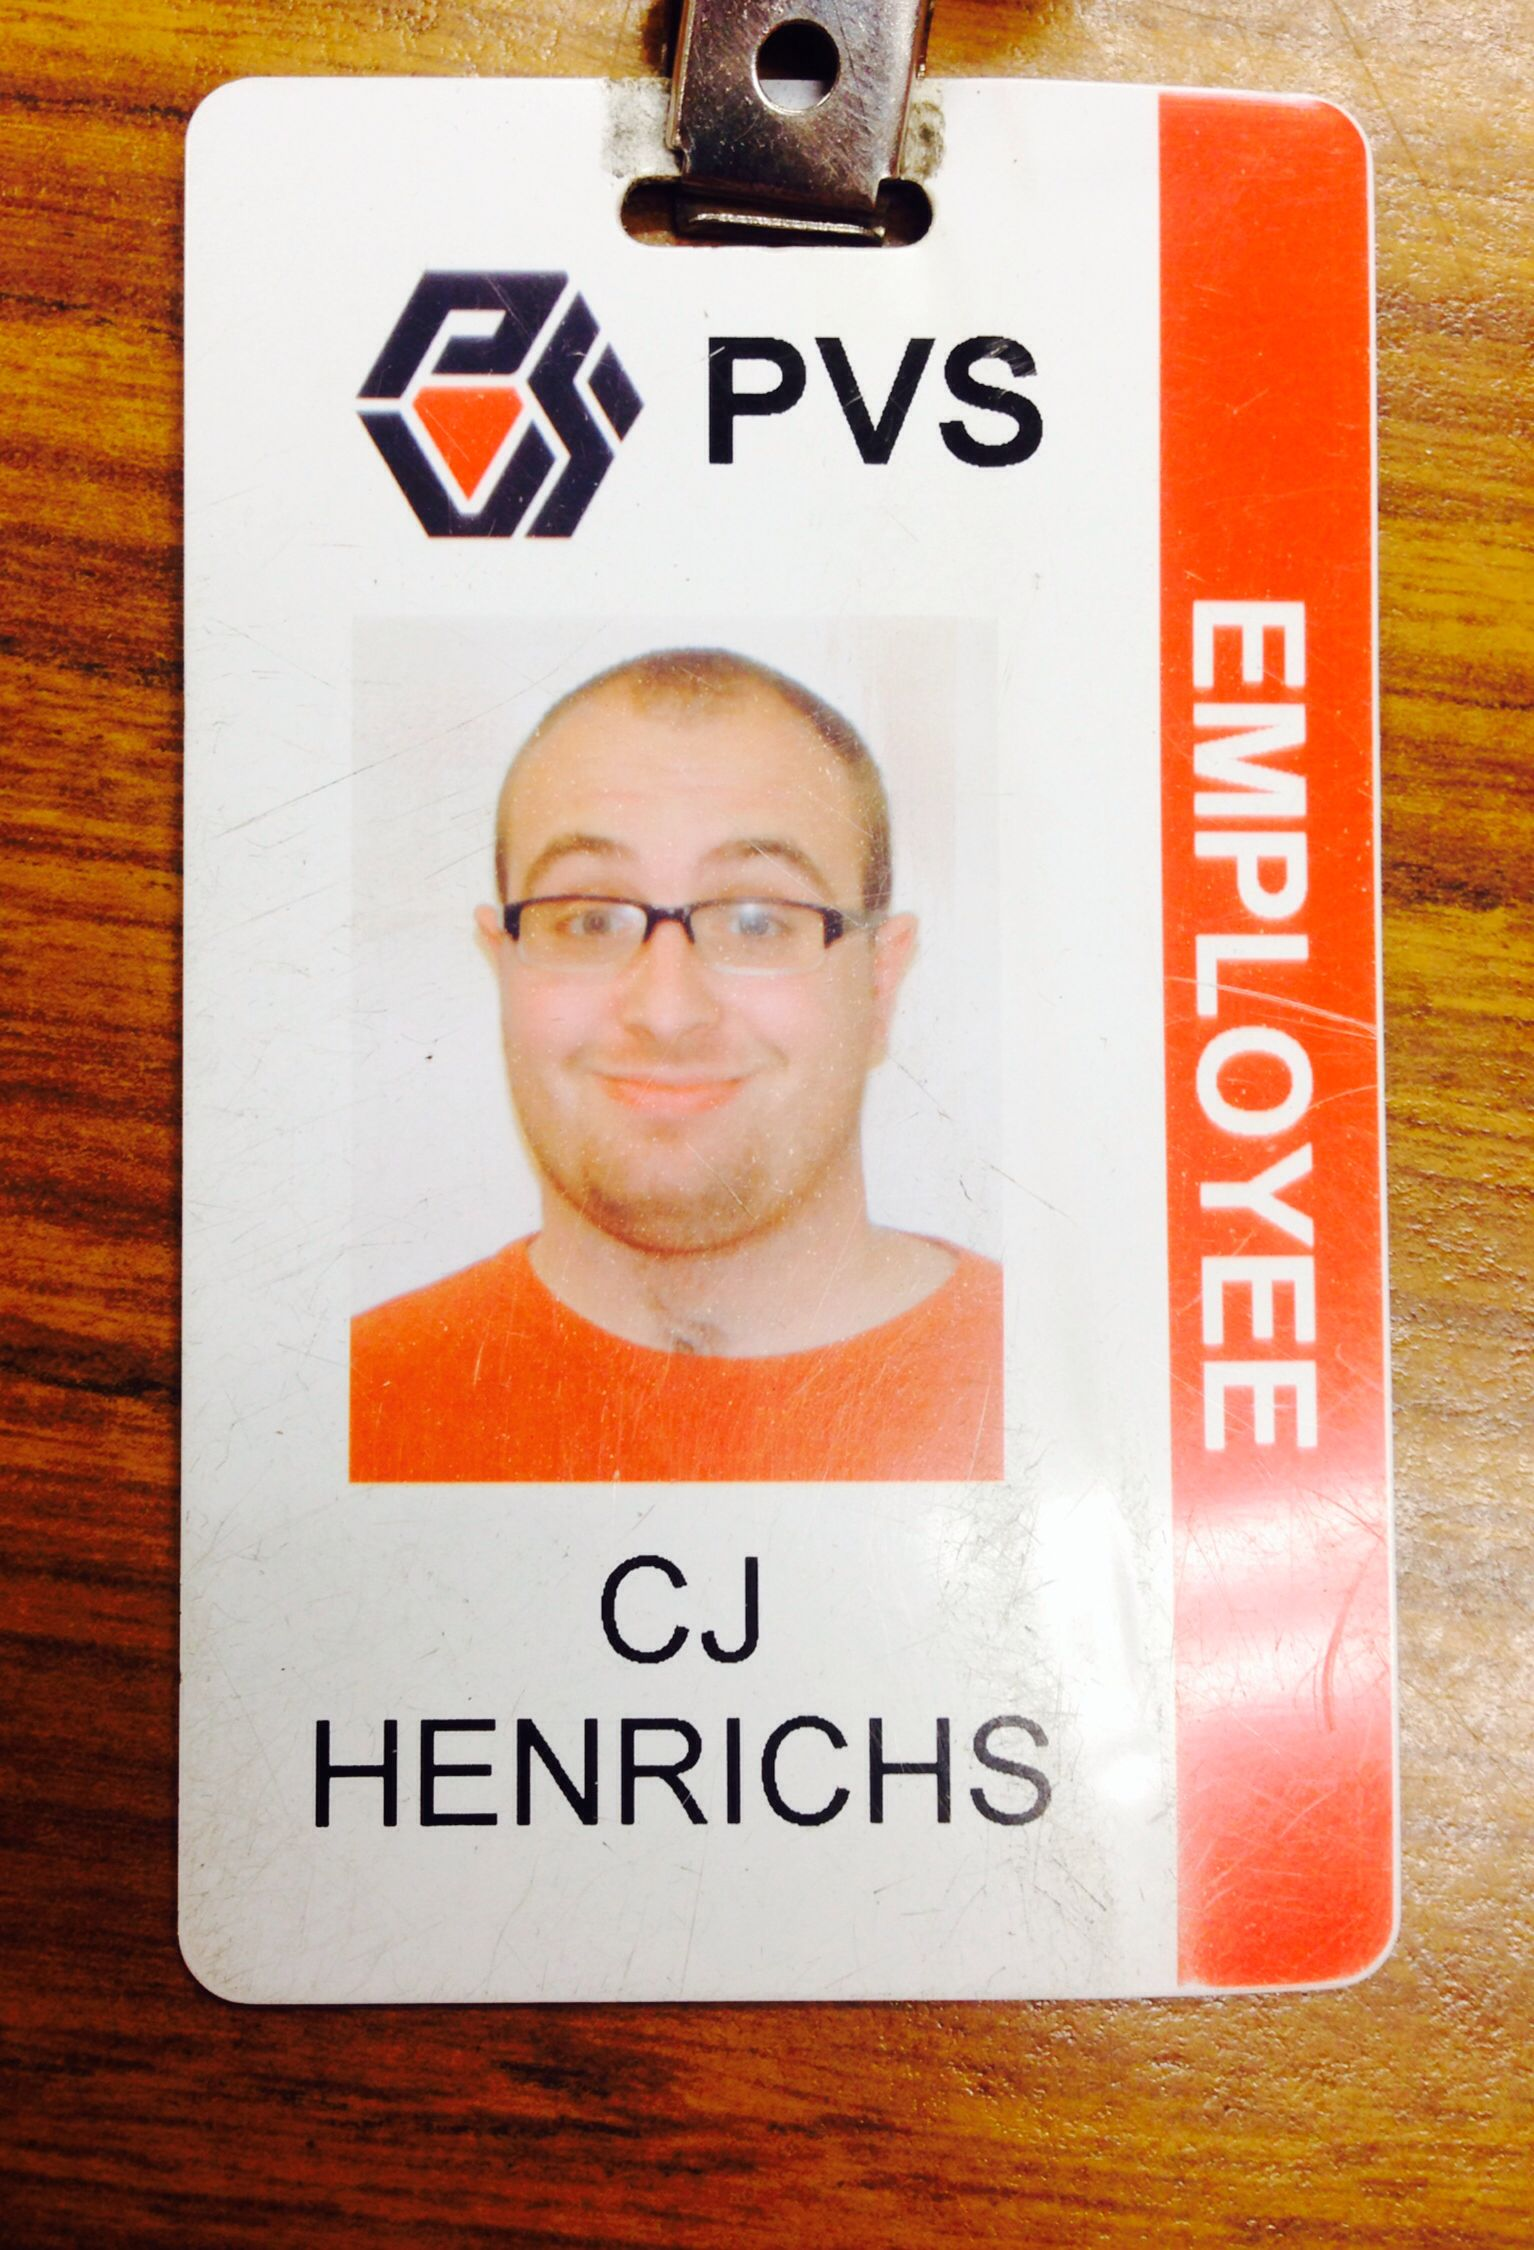 My Employee Id Card Photo Id Photo Pinterest Employee Id Card